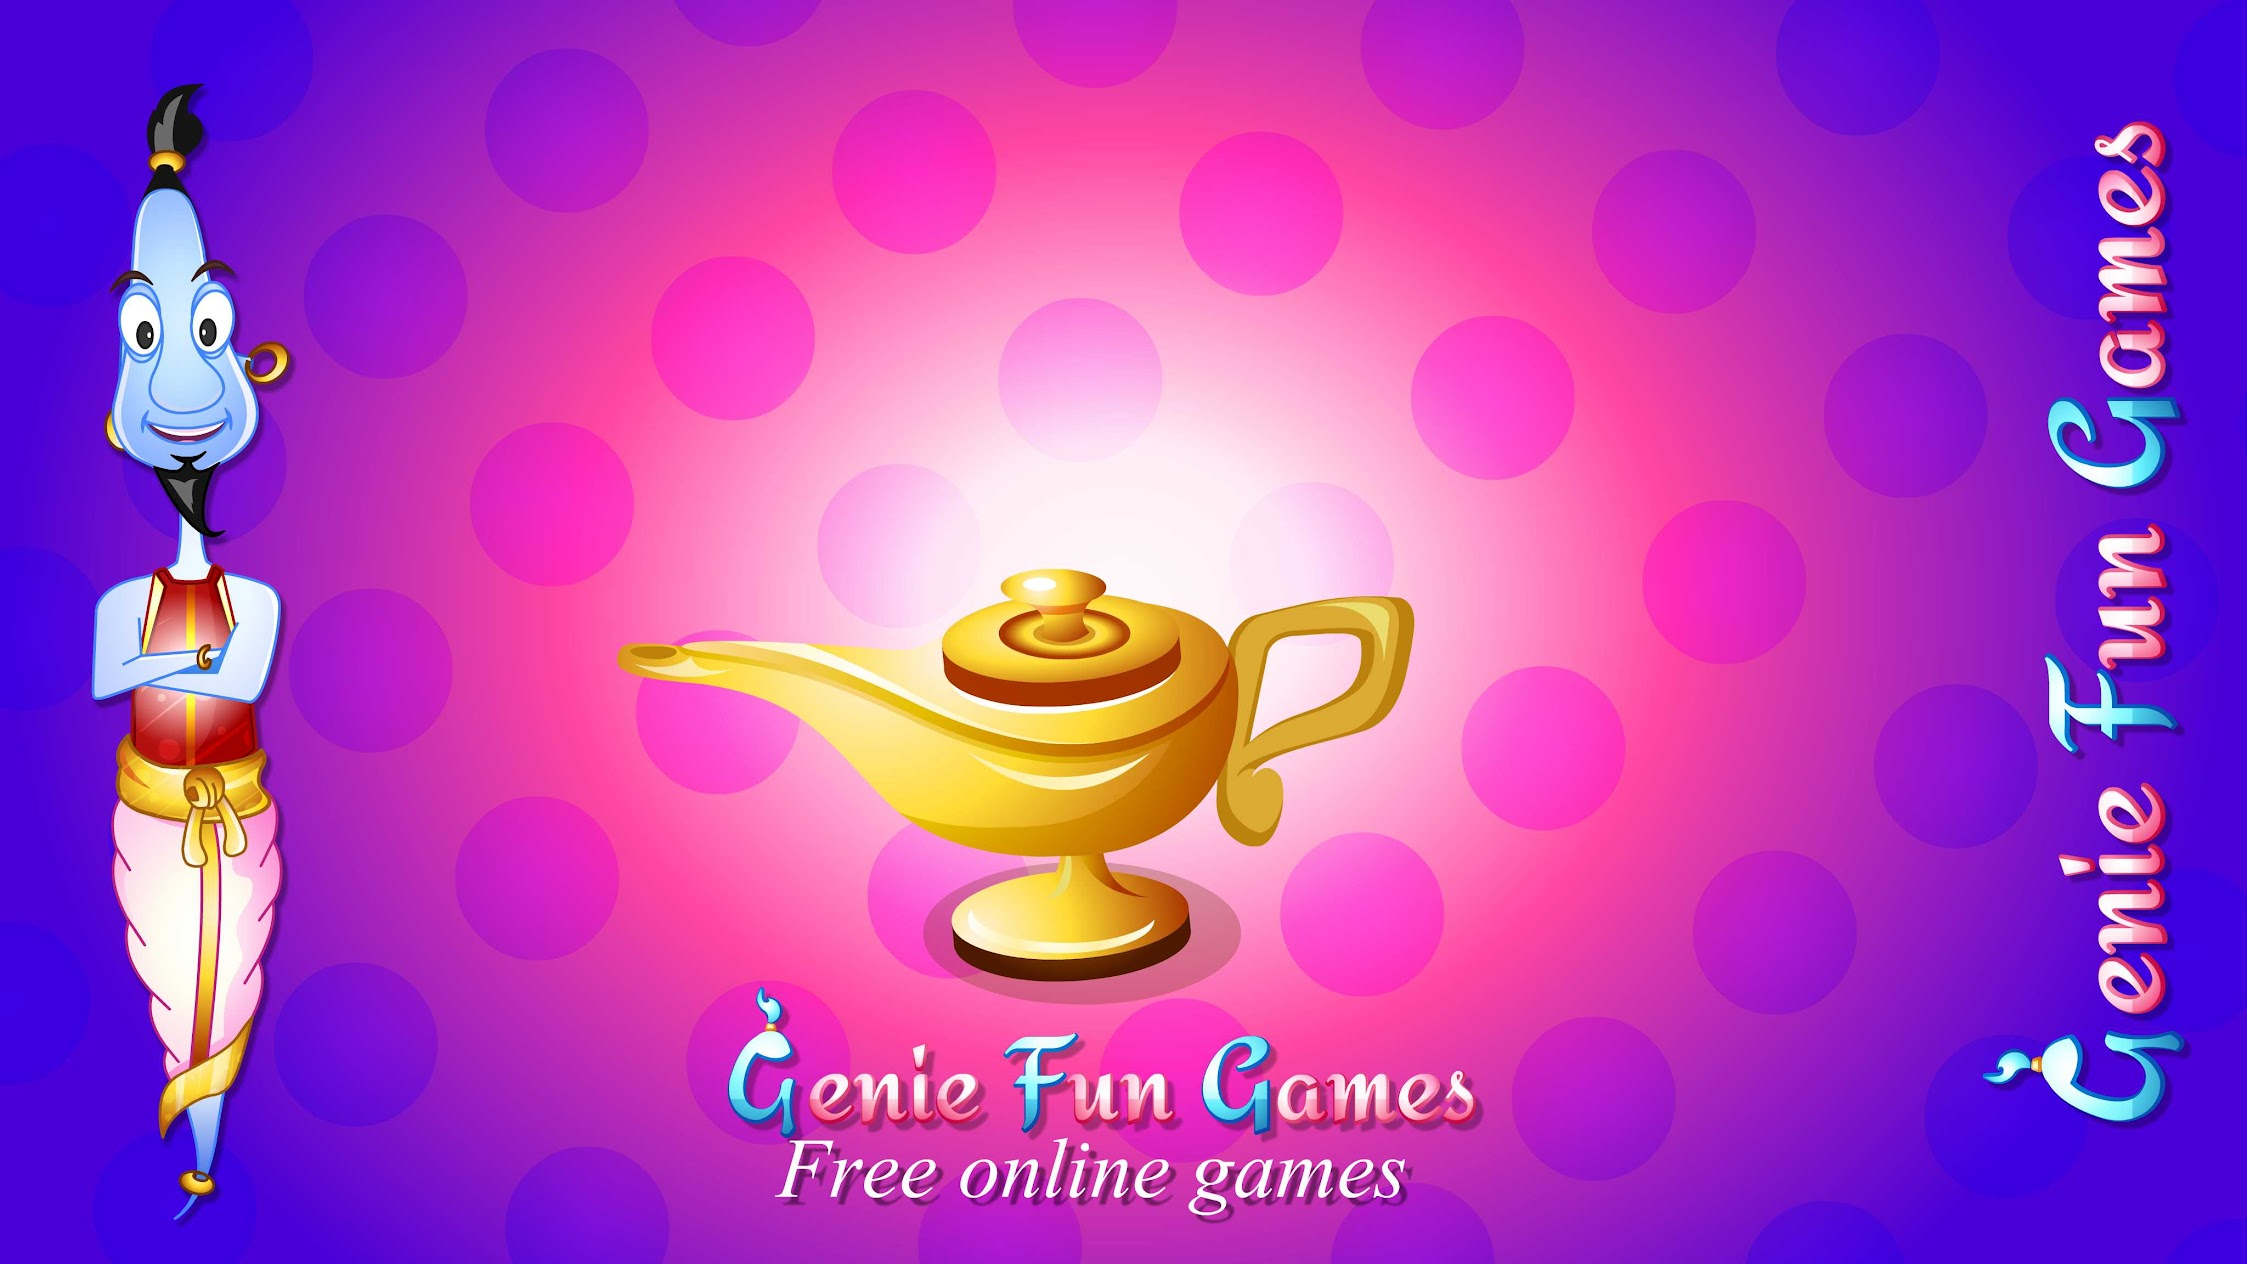 Genie Fun Games